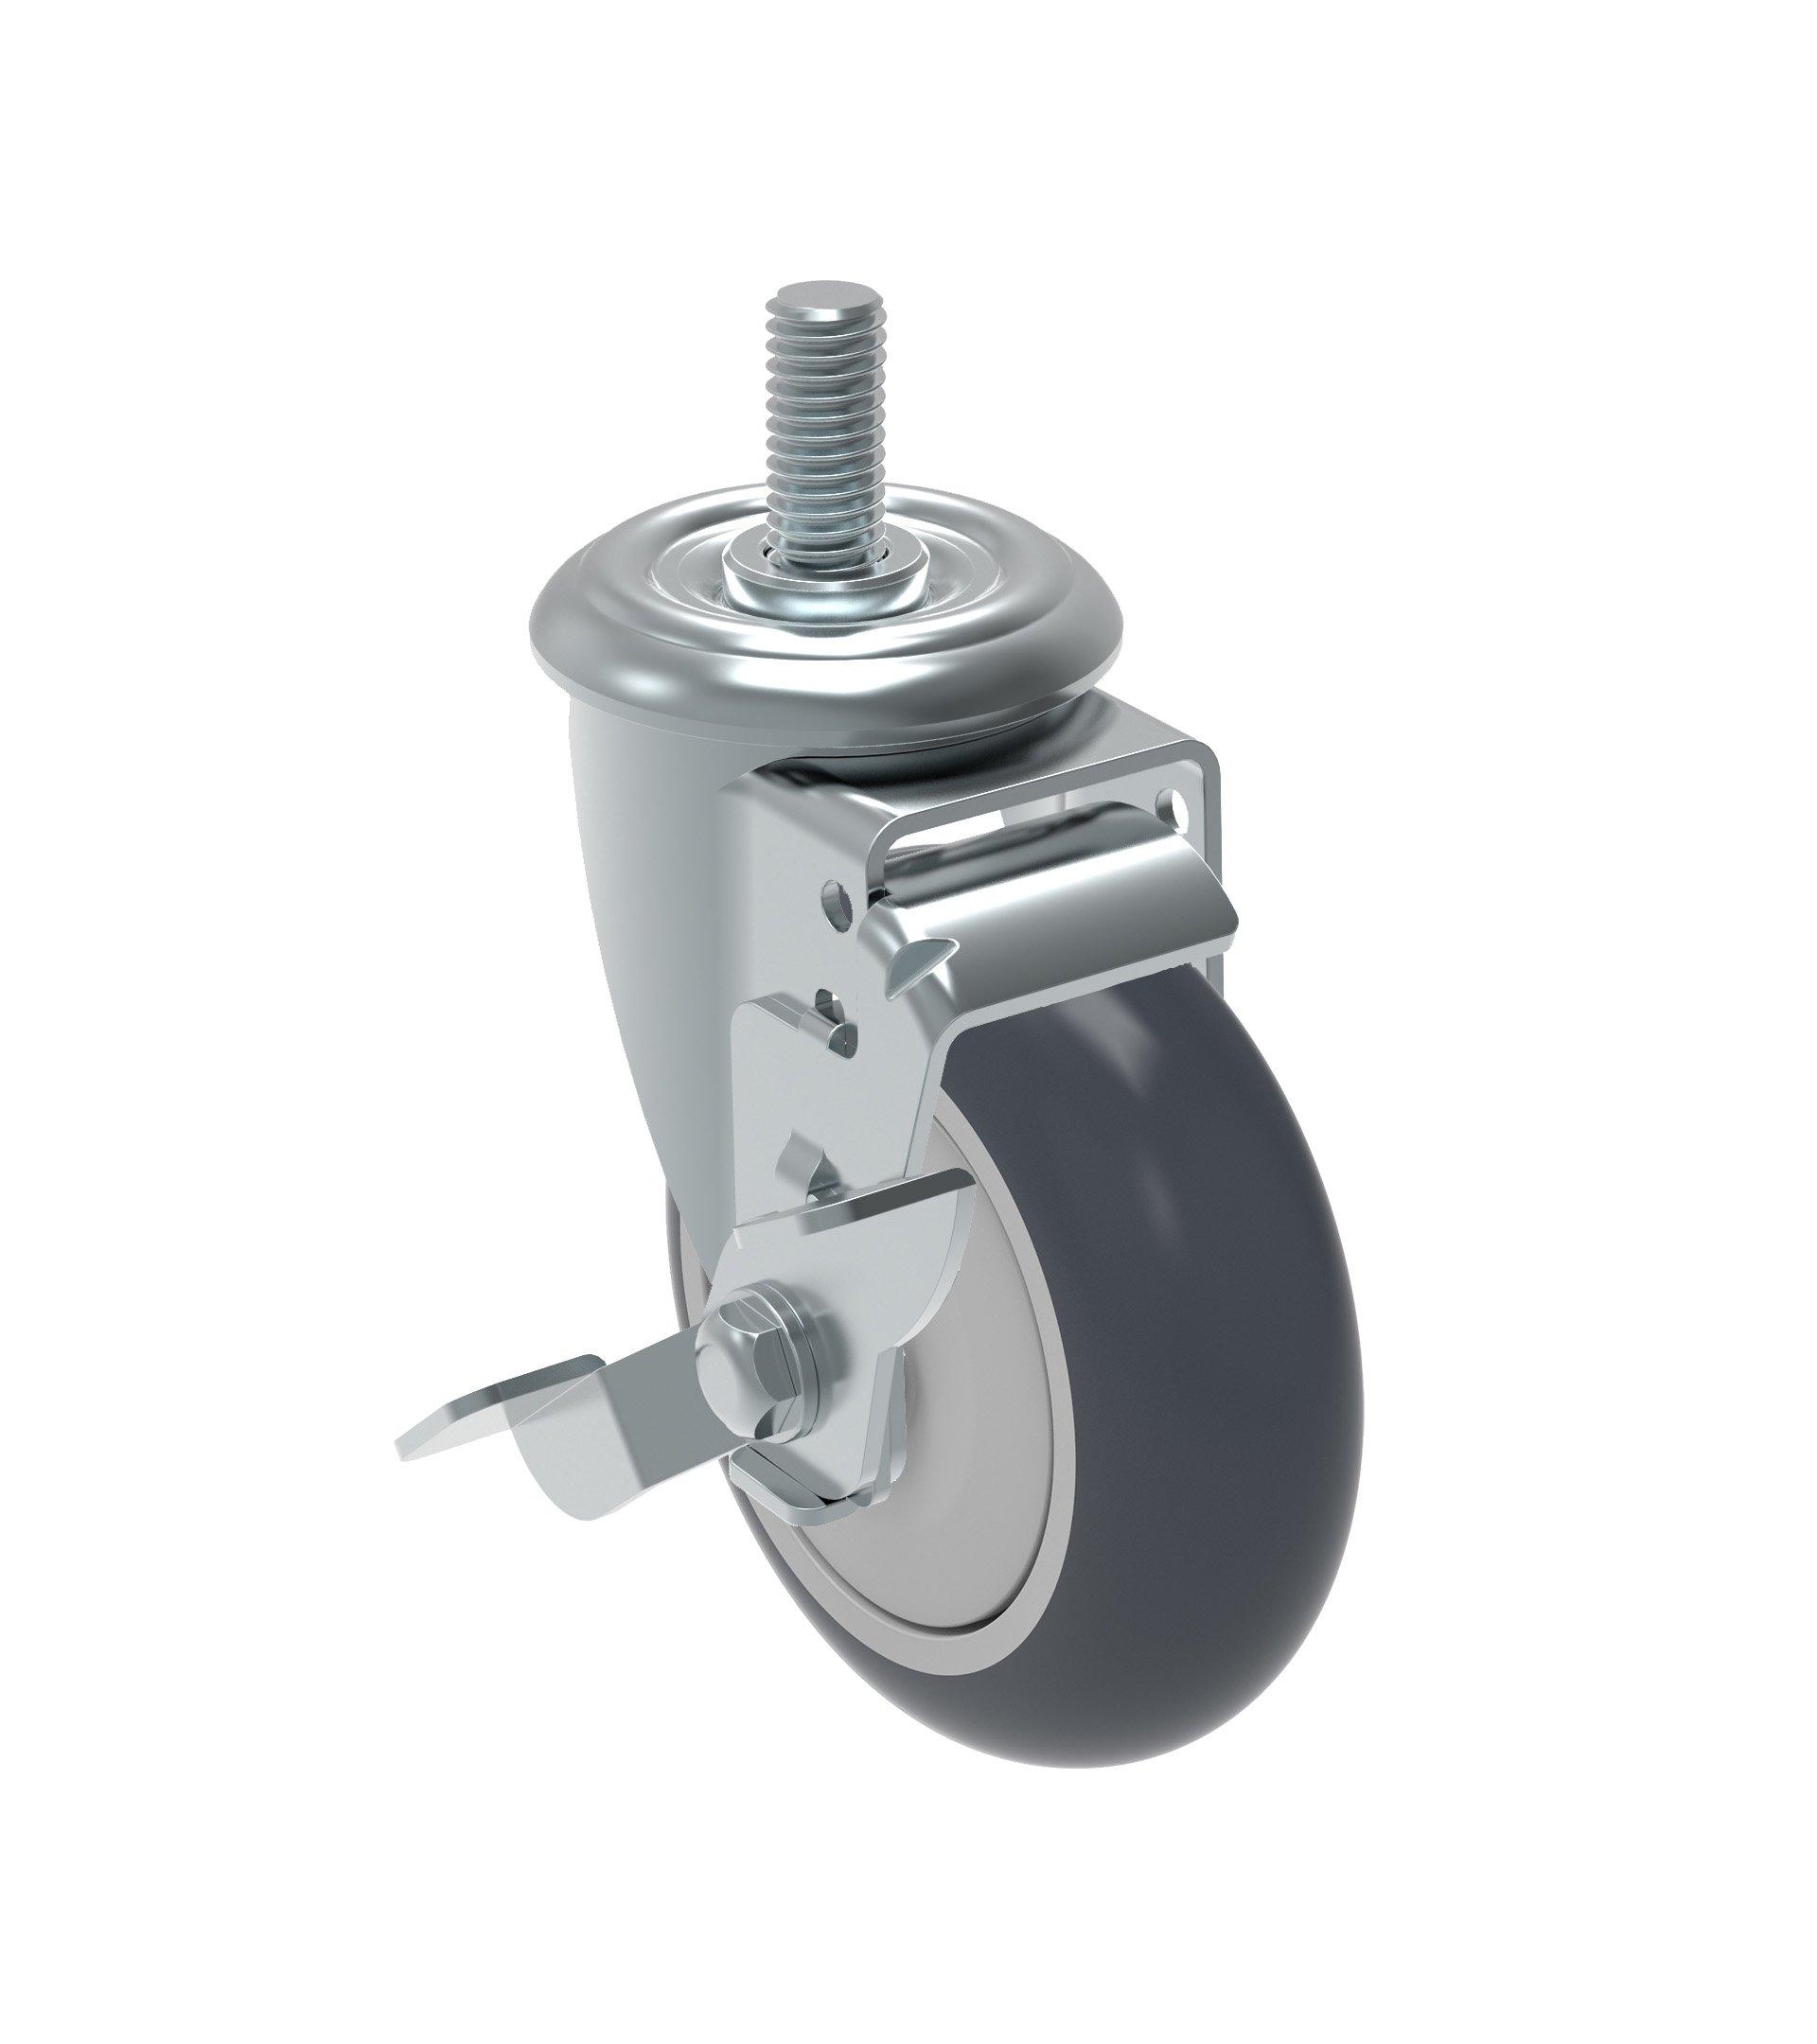 Schioppa GLEHF 412 TBE SL L12 Series 4'' x 1-1/4'' Diameter Swivel Caster with Wheel Lock Brake, Non-Marking Thermoplastic Rubber Precision Ball Bearing Wheel, 12 mm Diameter x 40 mm Length Threaded Stem, 220 lb